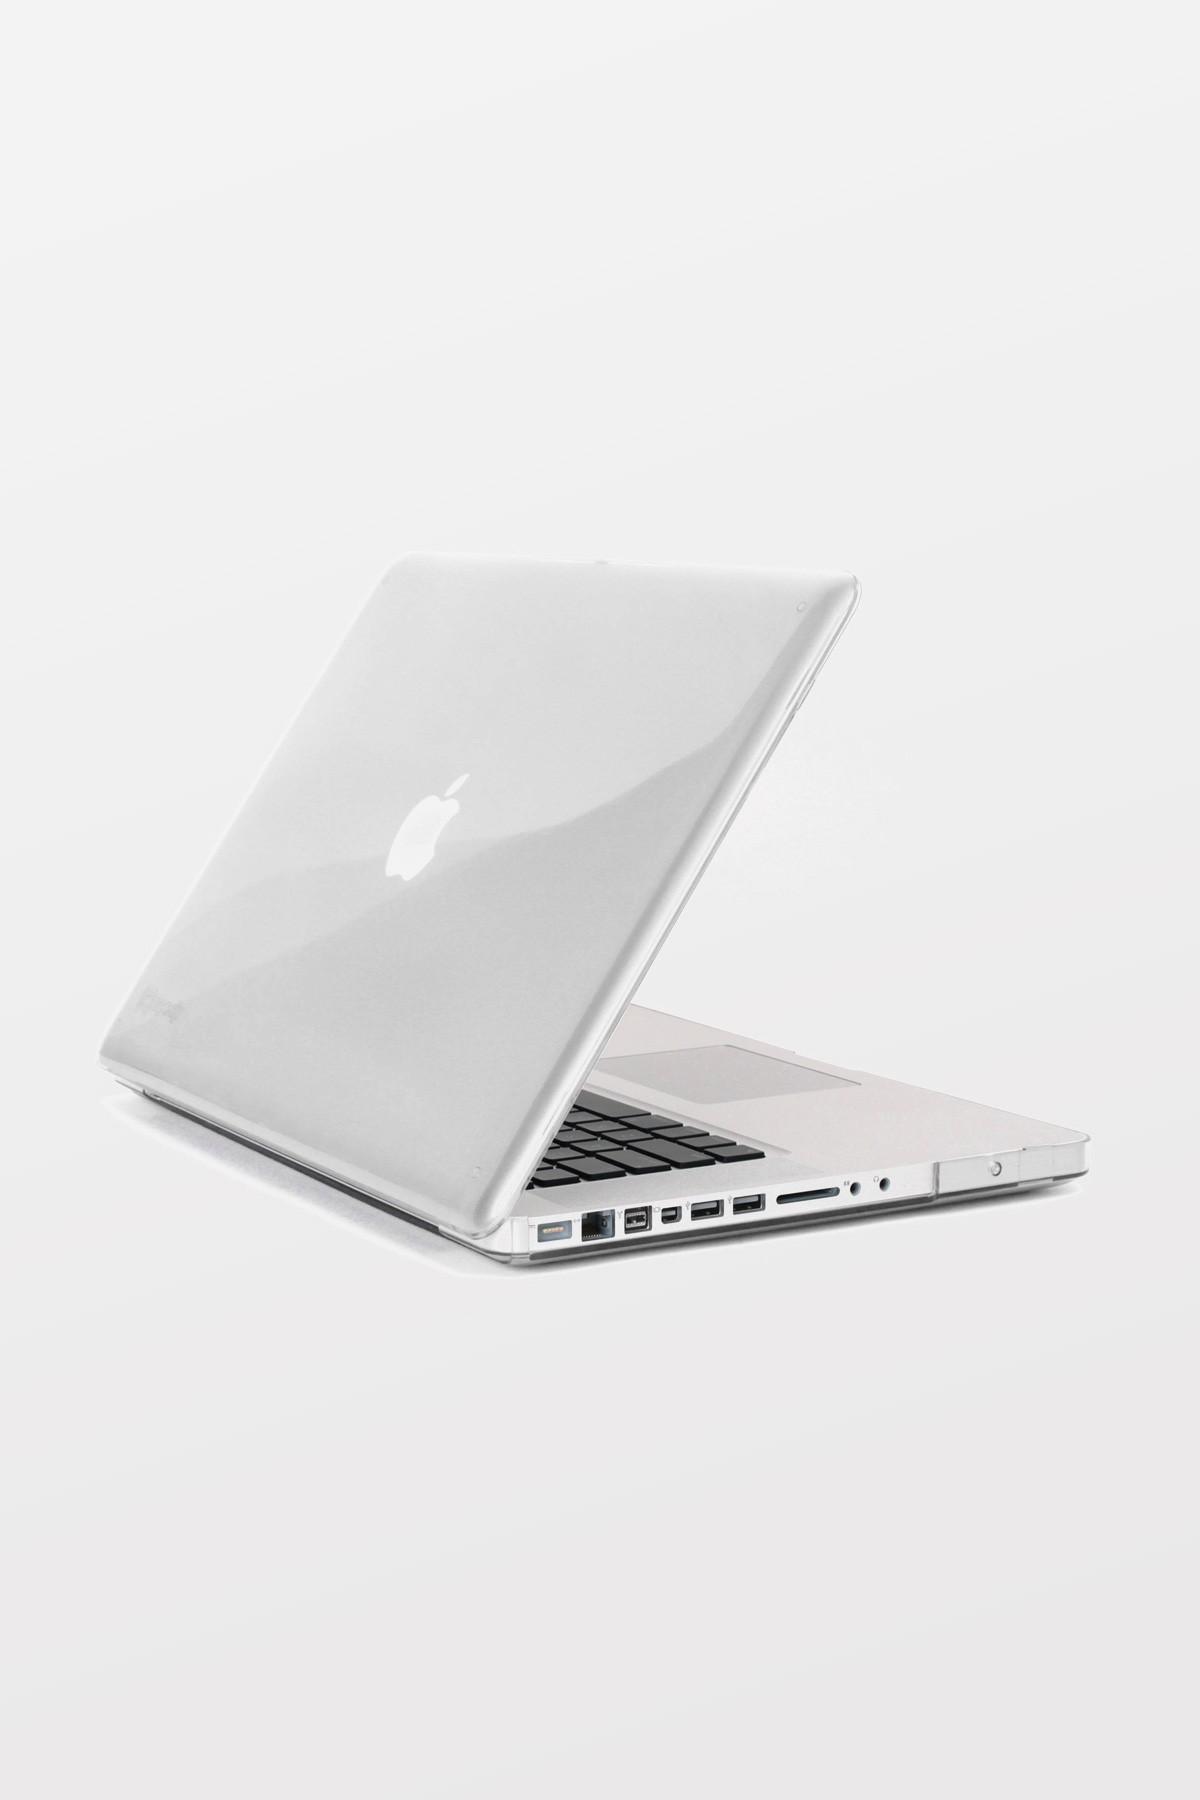 Speck MacBook Pro 15-inch SeeThru Clear (non-retina)